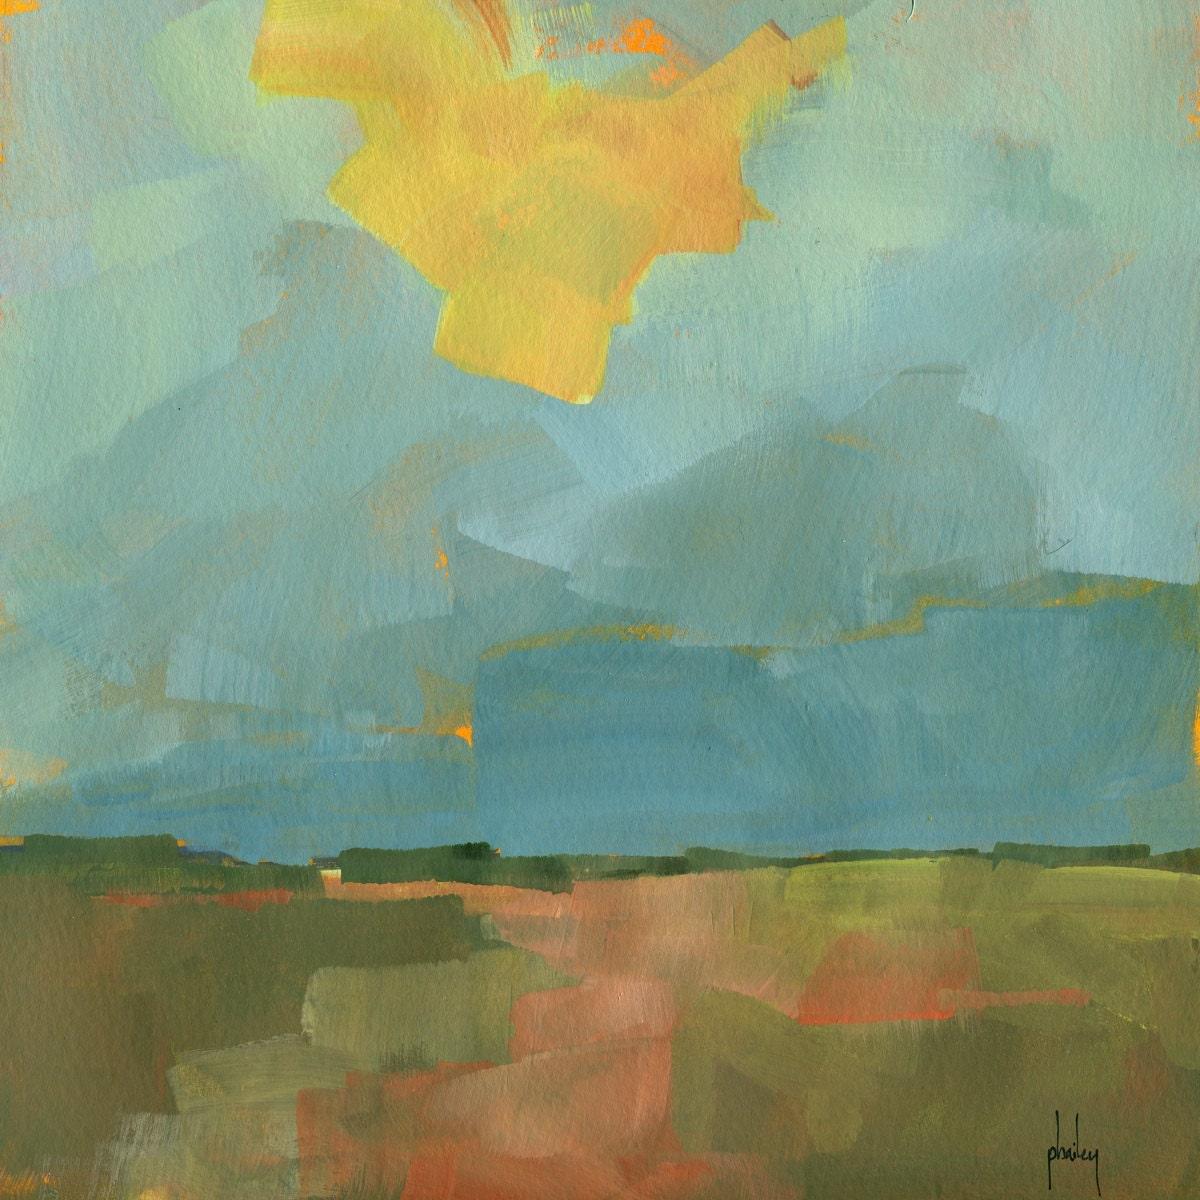 Original acrylic semi abstract landscape painting breaking for Abstract painting in acrylic